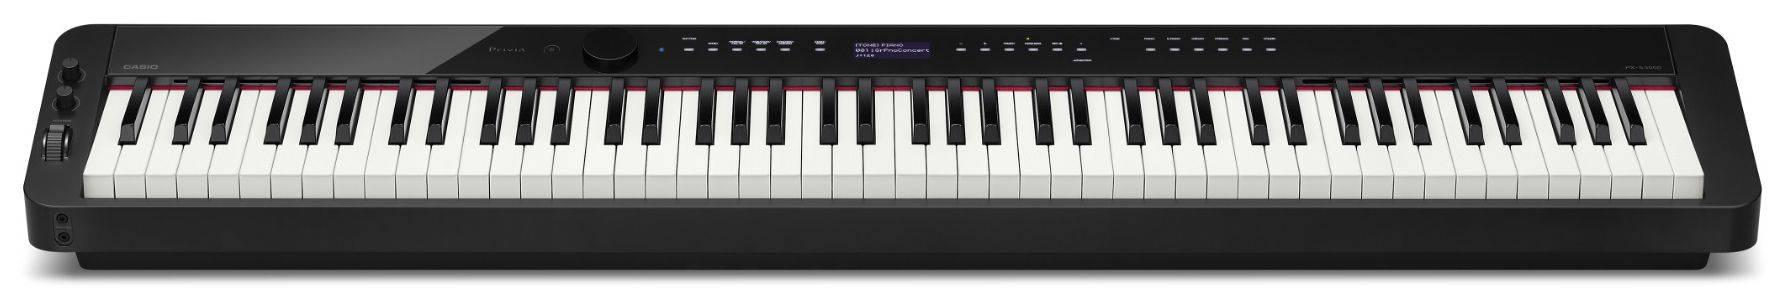 Casio PX-S3000BK Black 88 Key 700 Tones 200 Rhythms Digital Piano Product Image 4